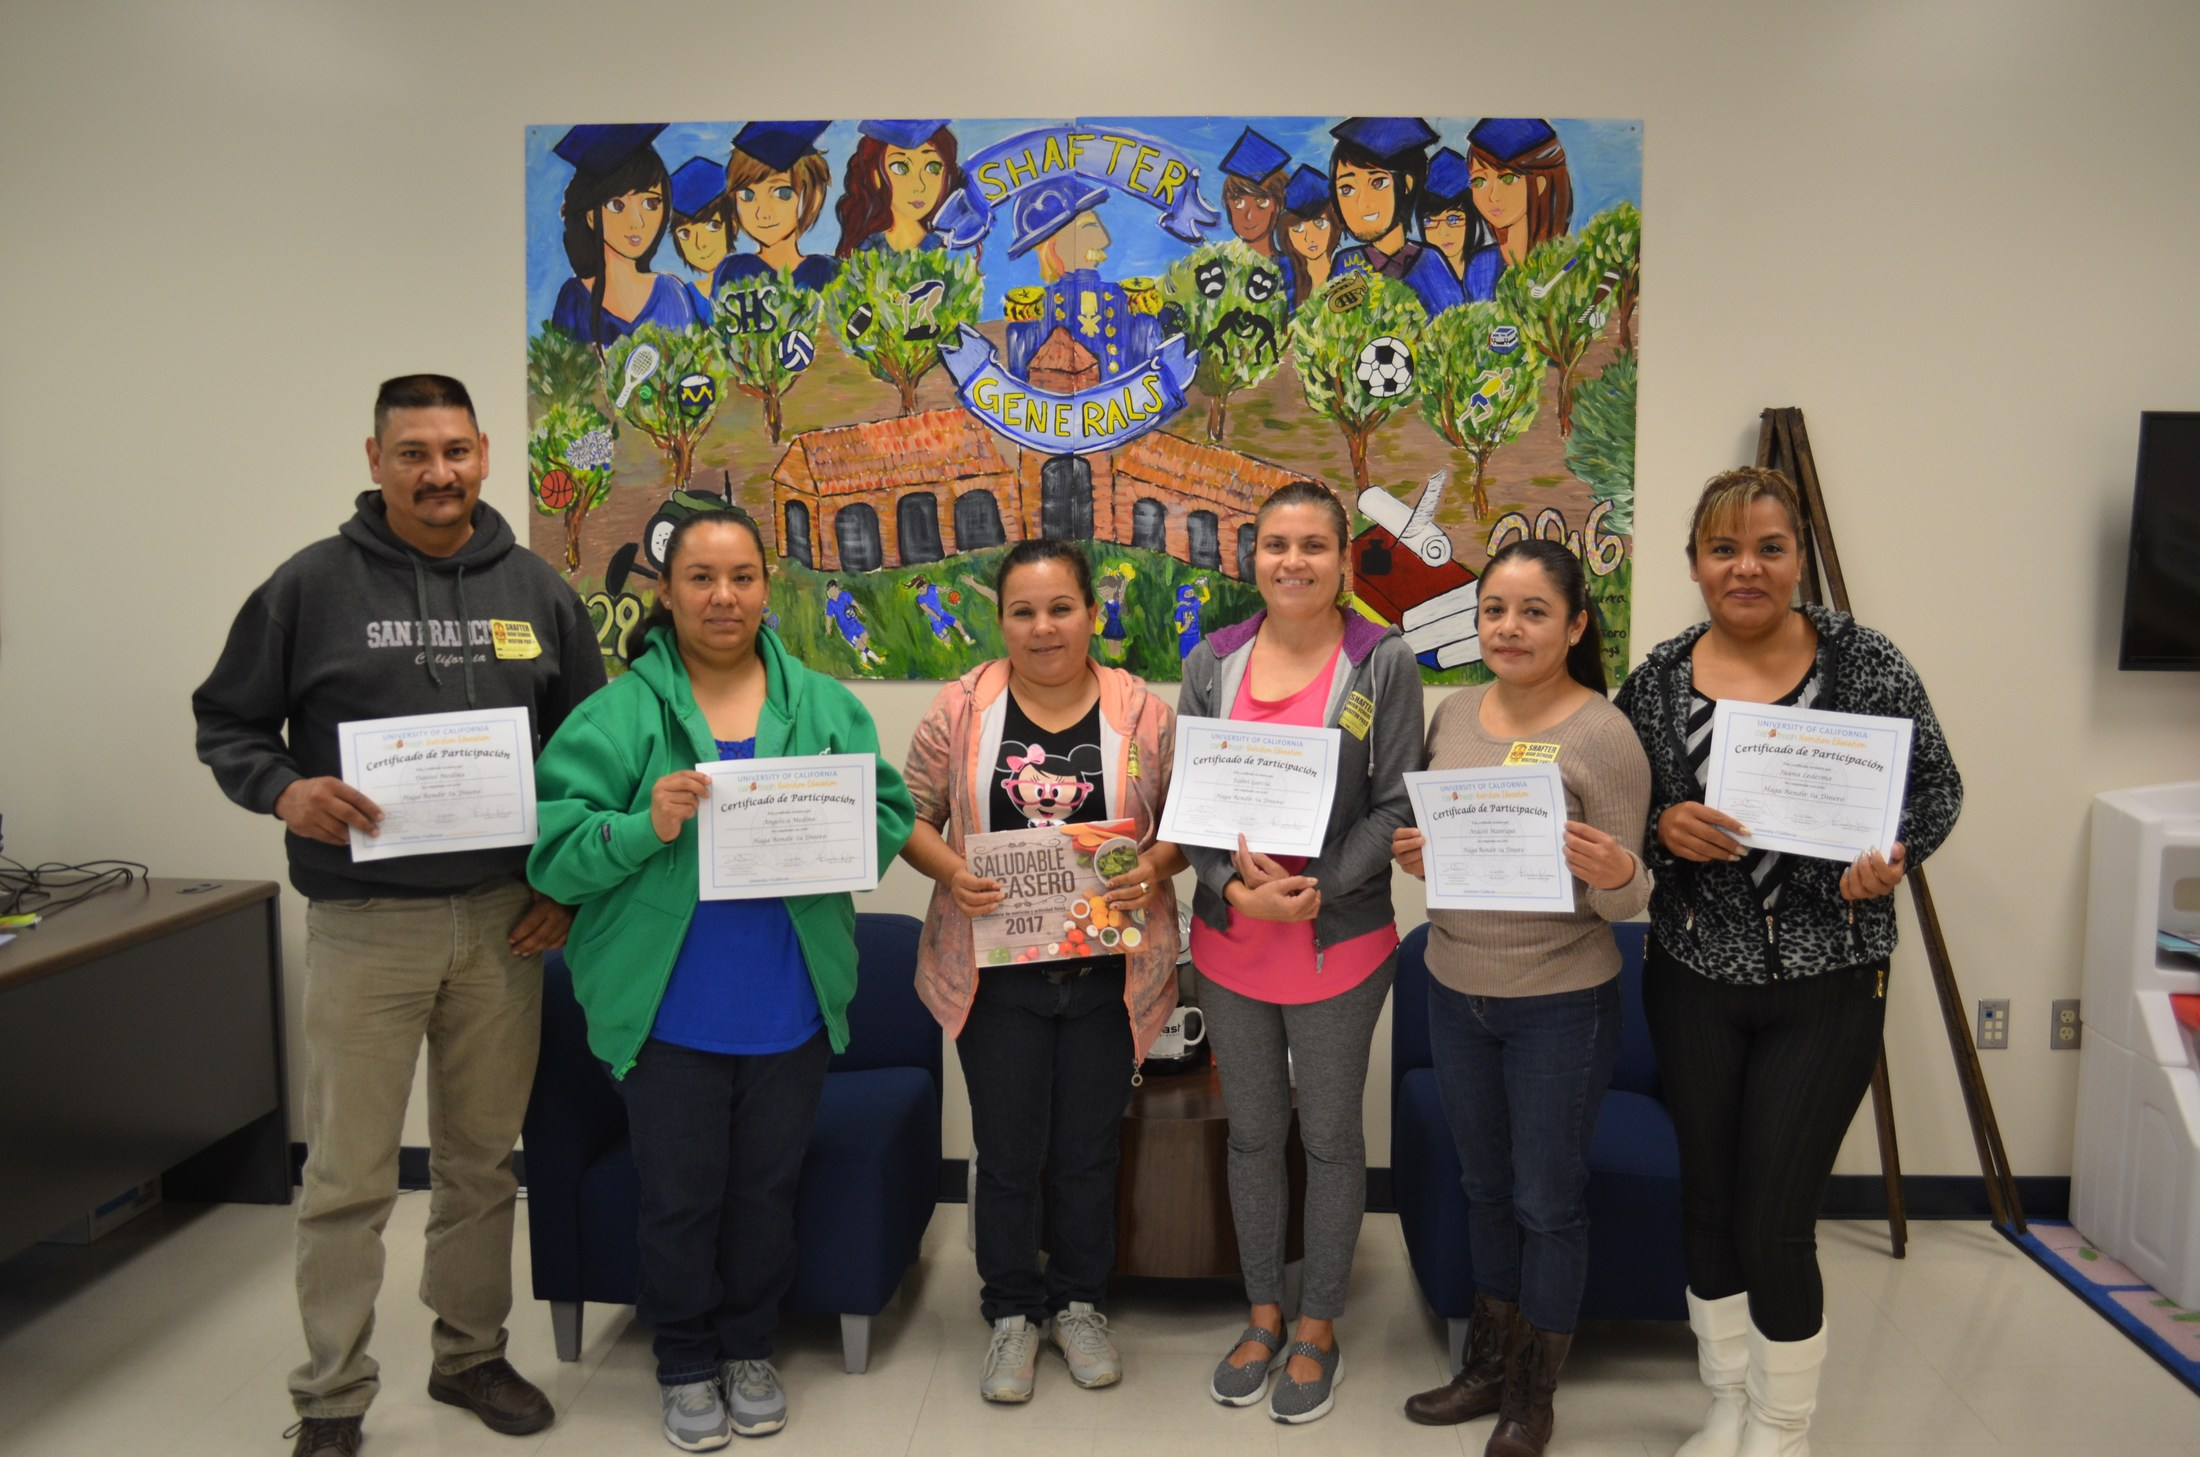 Shafter Center graduates